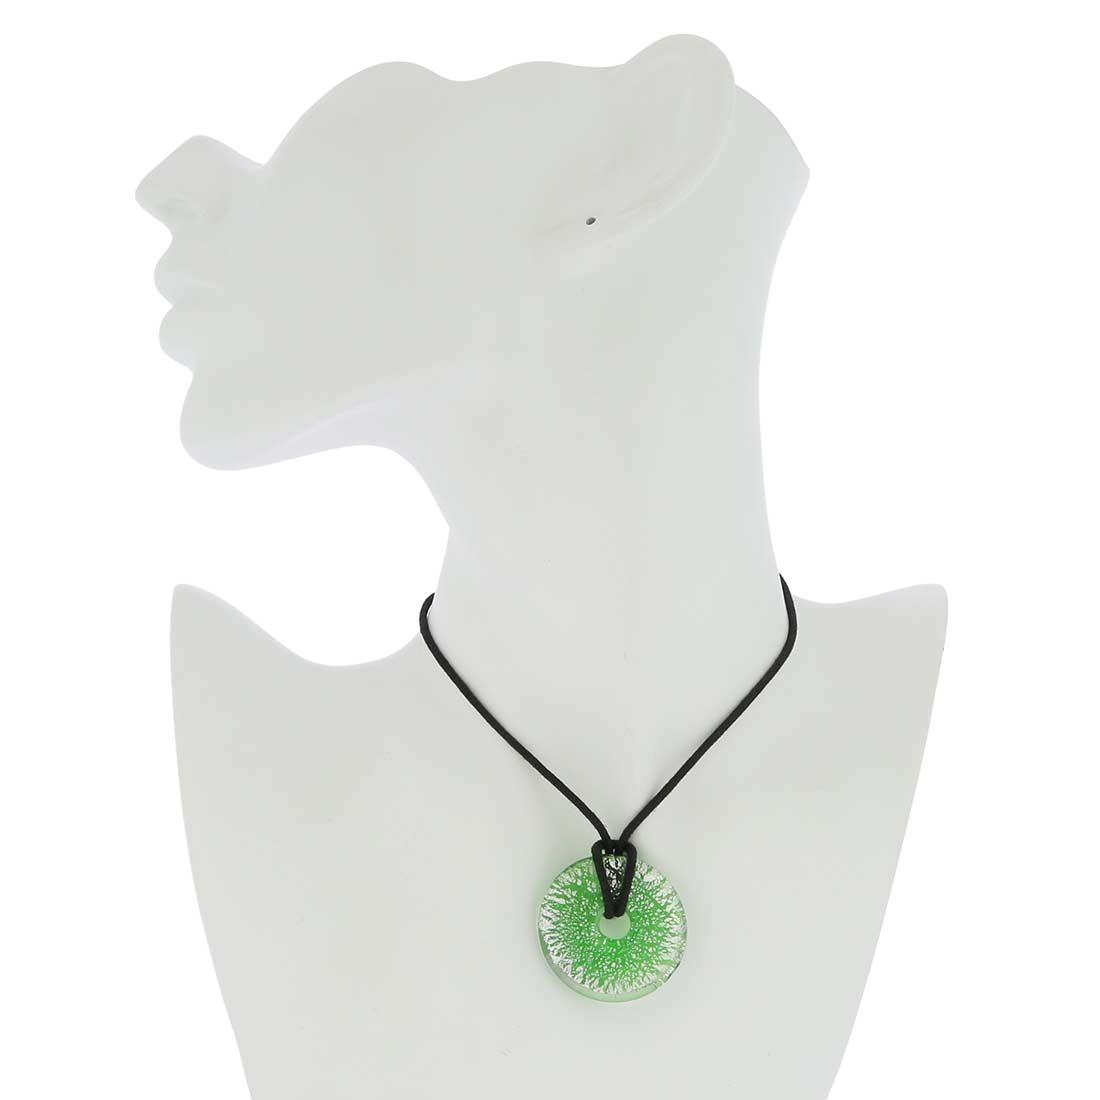 Silver Rain bagel pendant - Green